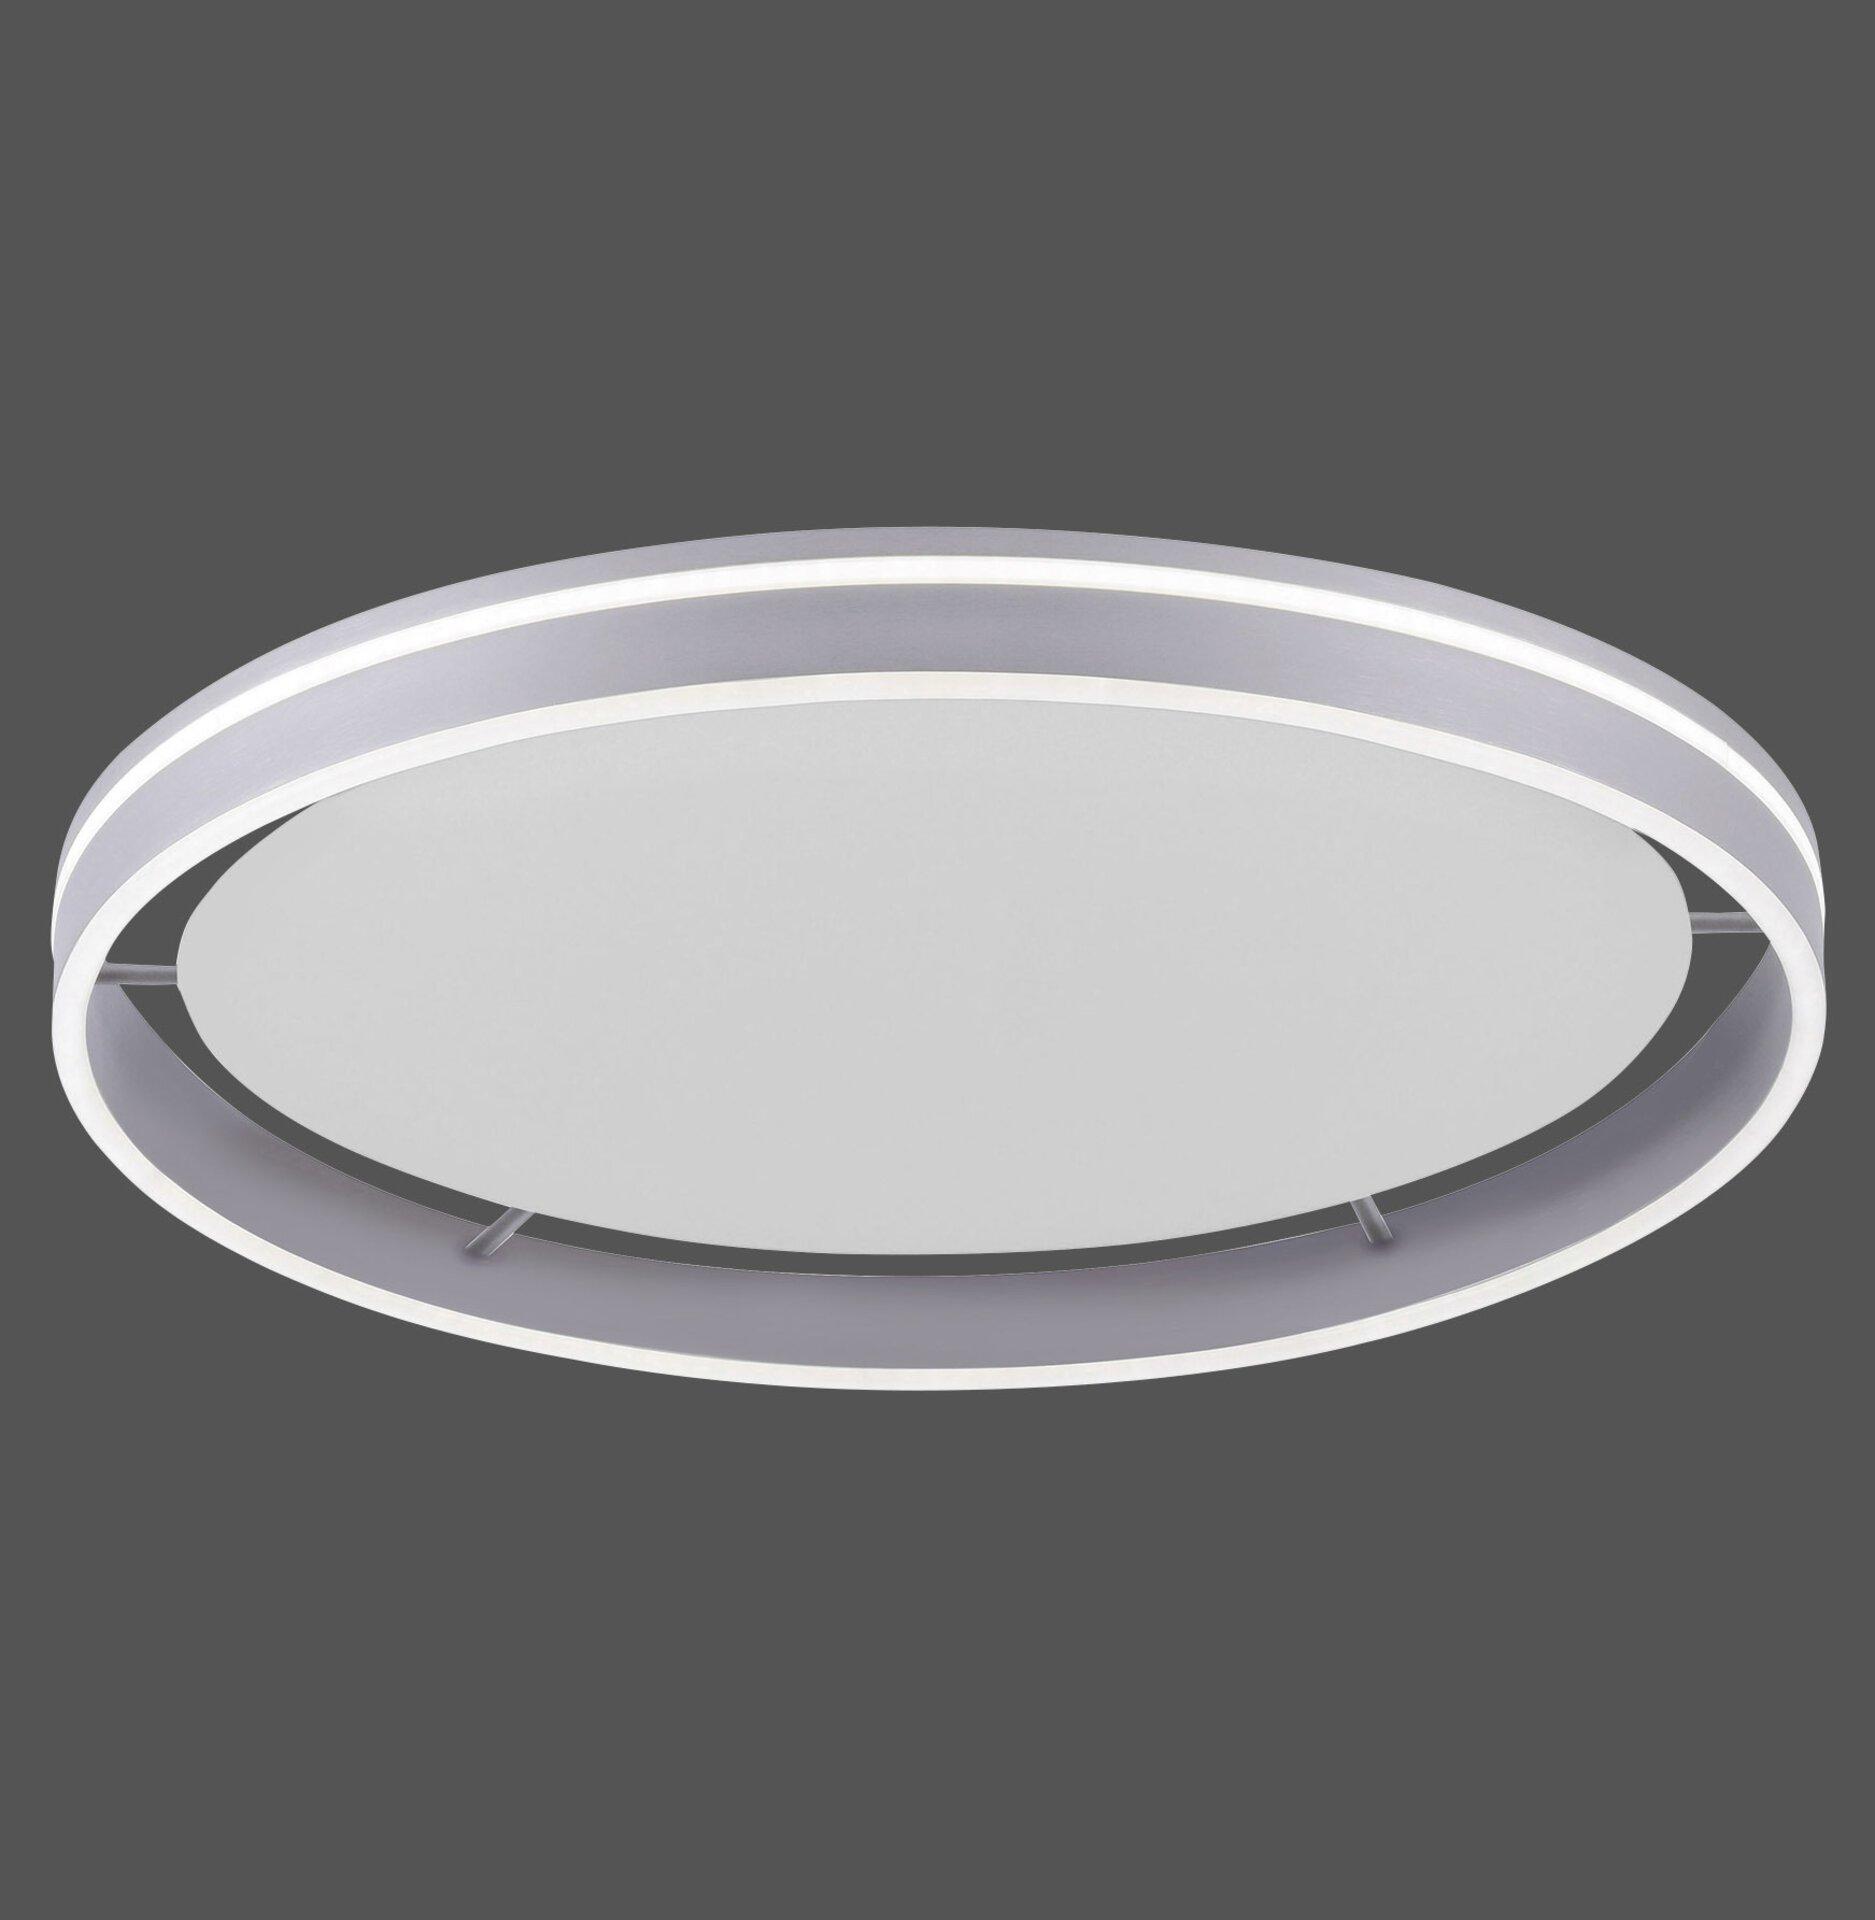 Smart-Home-Leuchten Q-VITO Paul Neuhaus Metall 59 x 8 x 59 cm